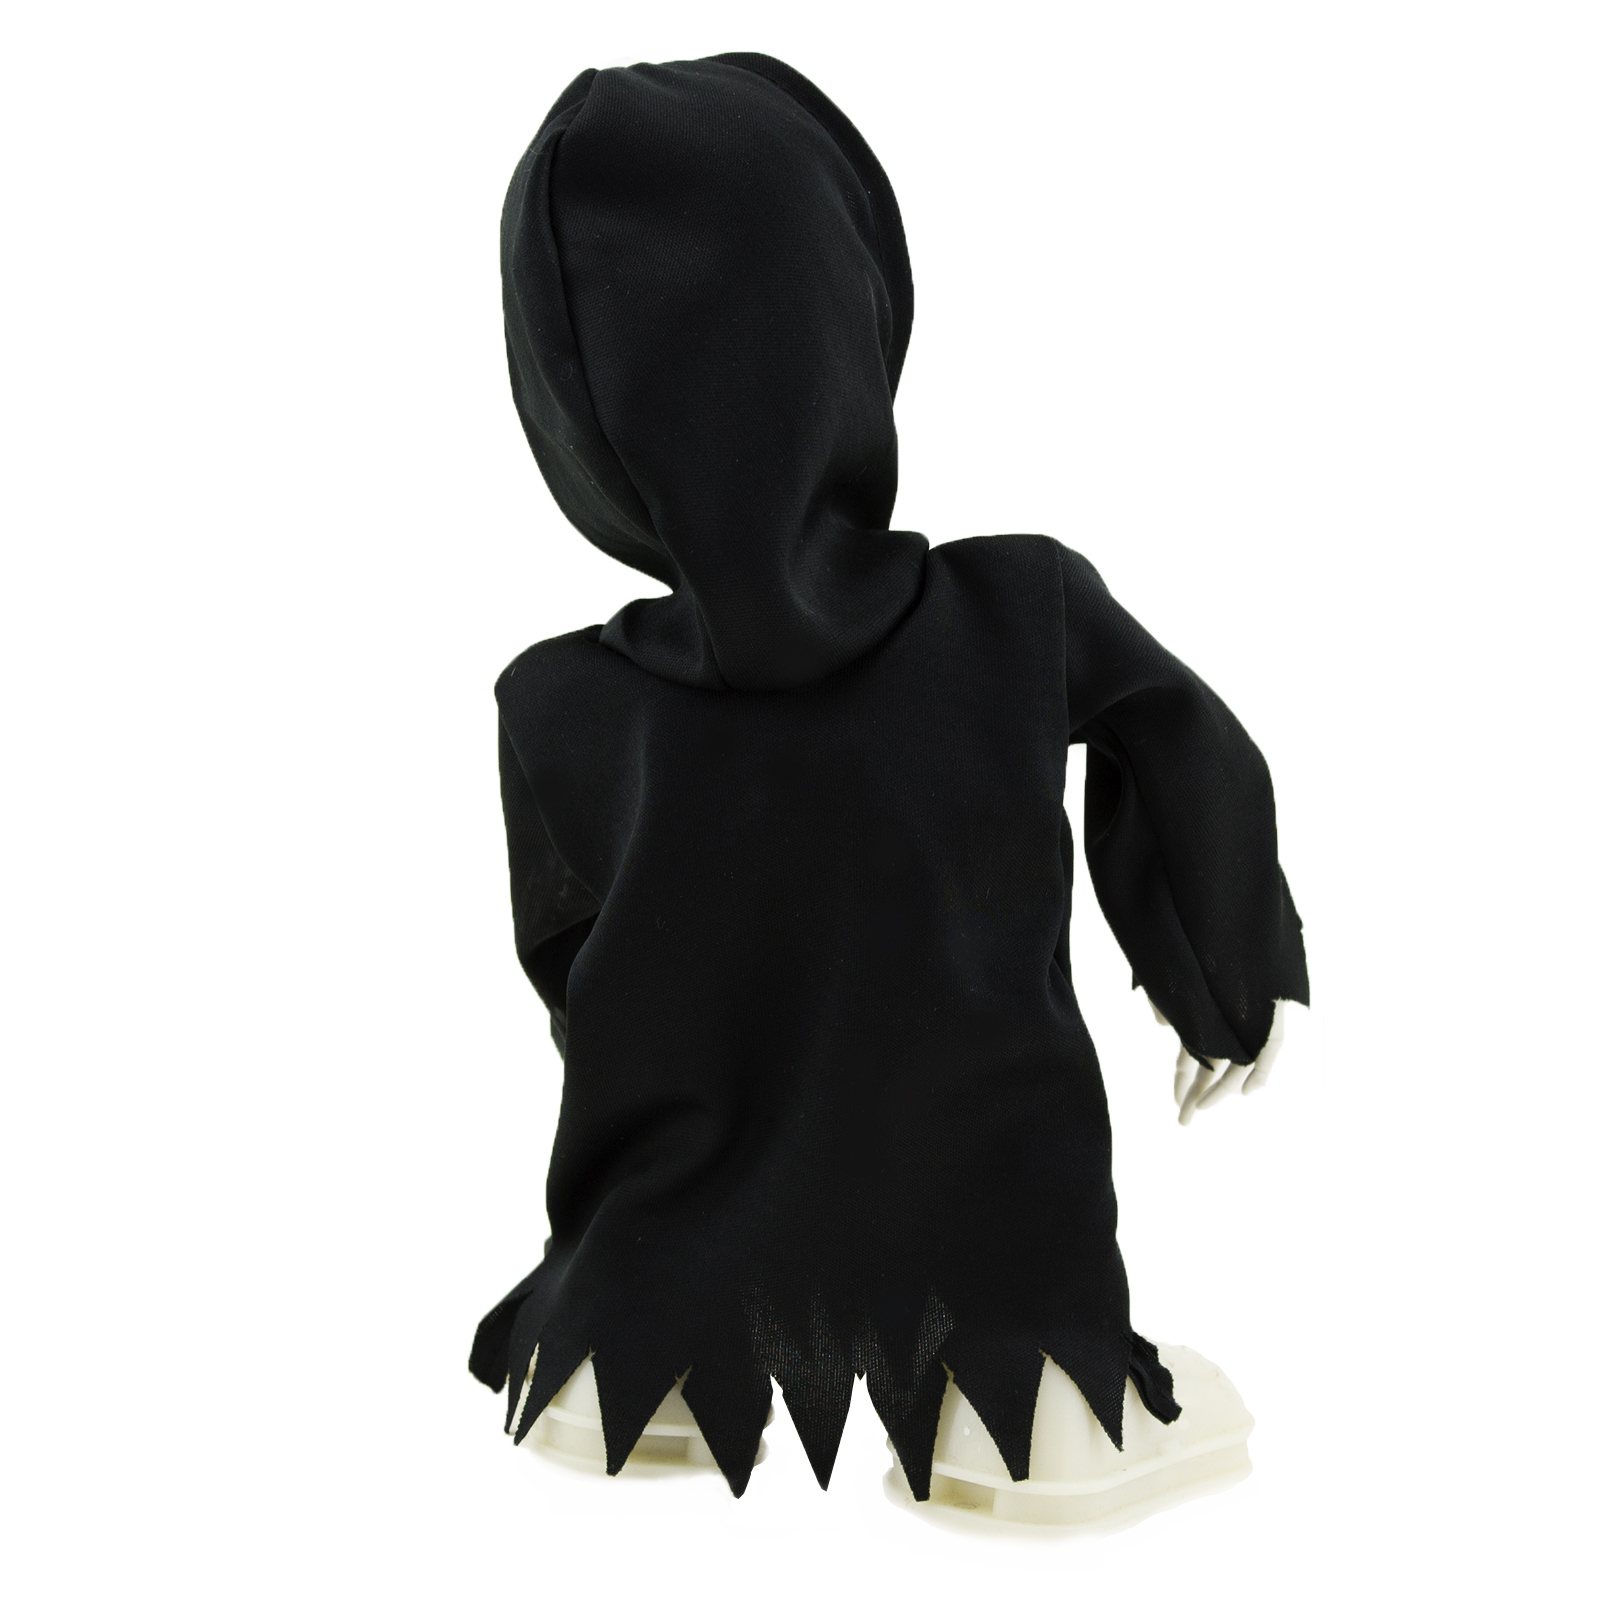 1600x1600 Walking Talking Light Up Grim Reaper Dancing Skeleton Halloween